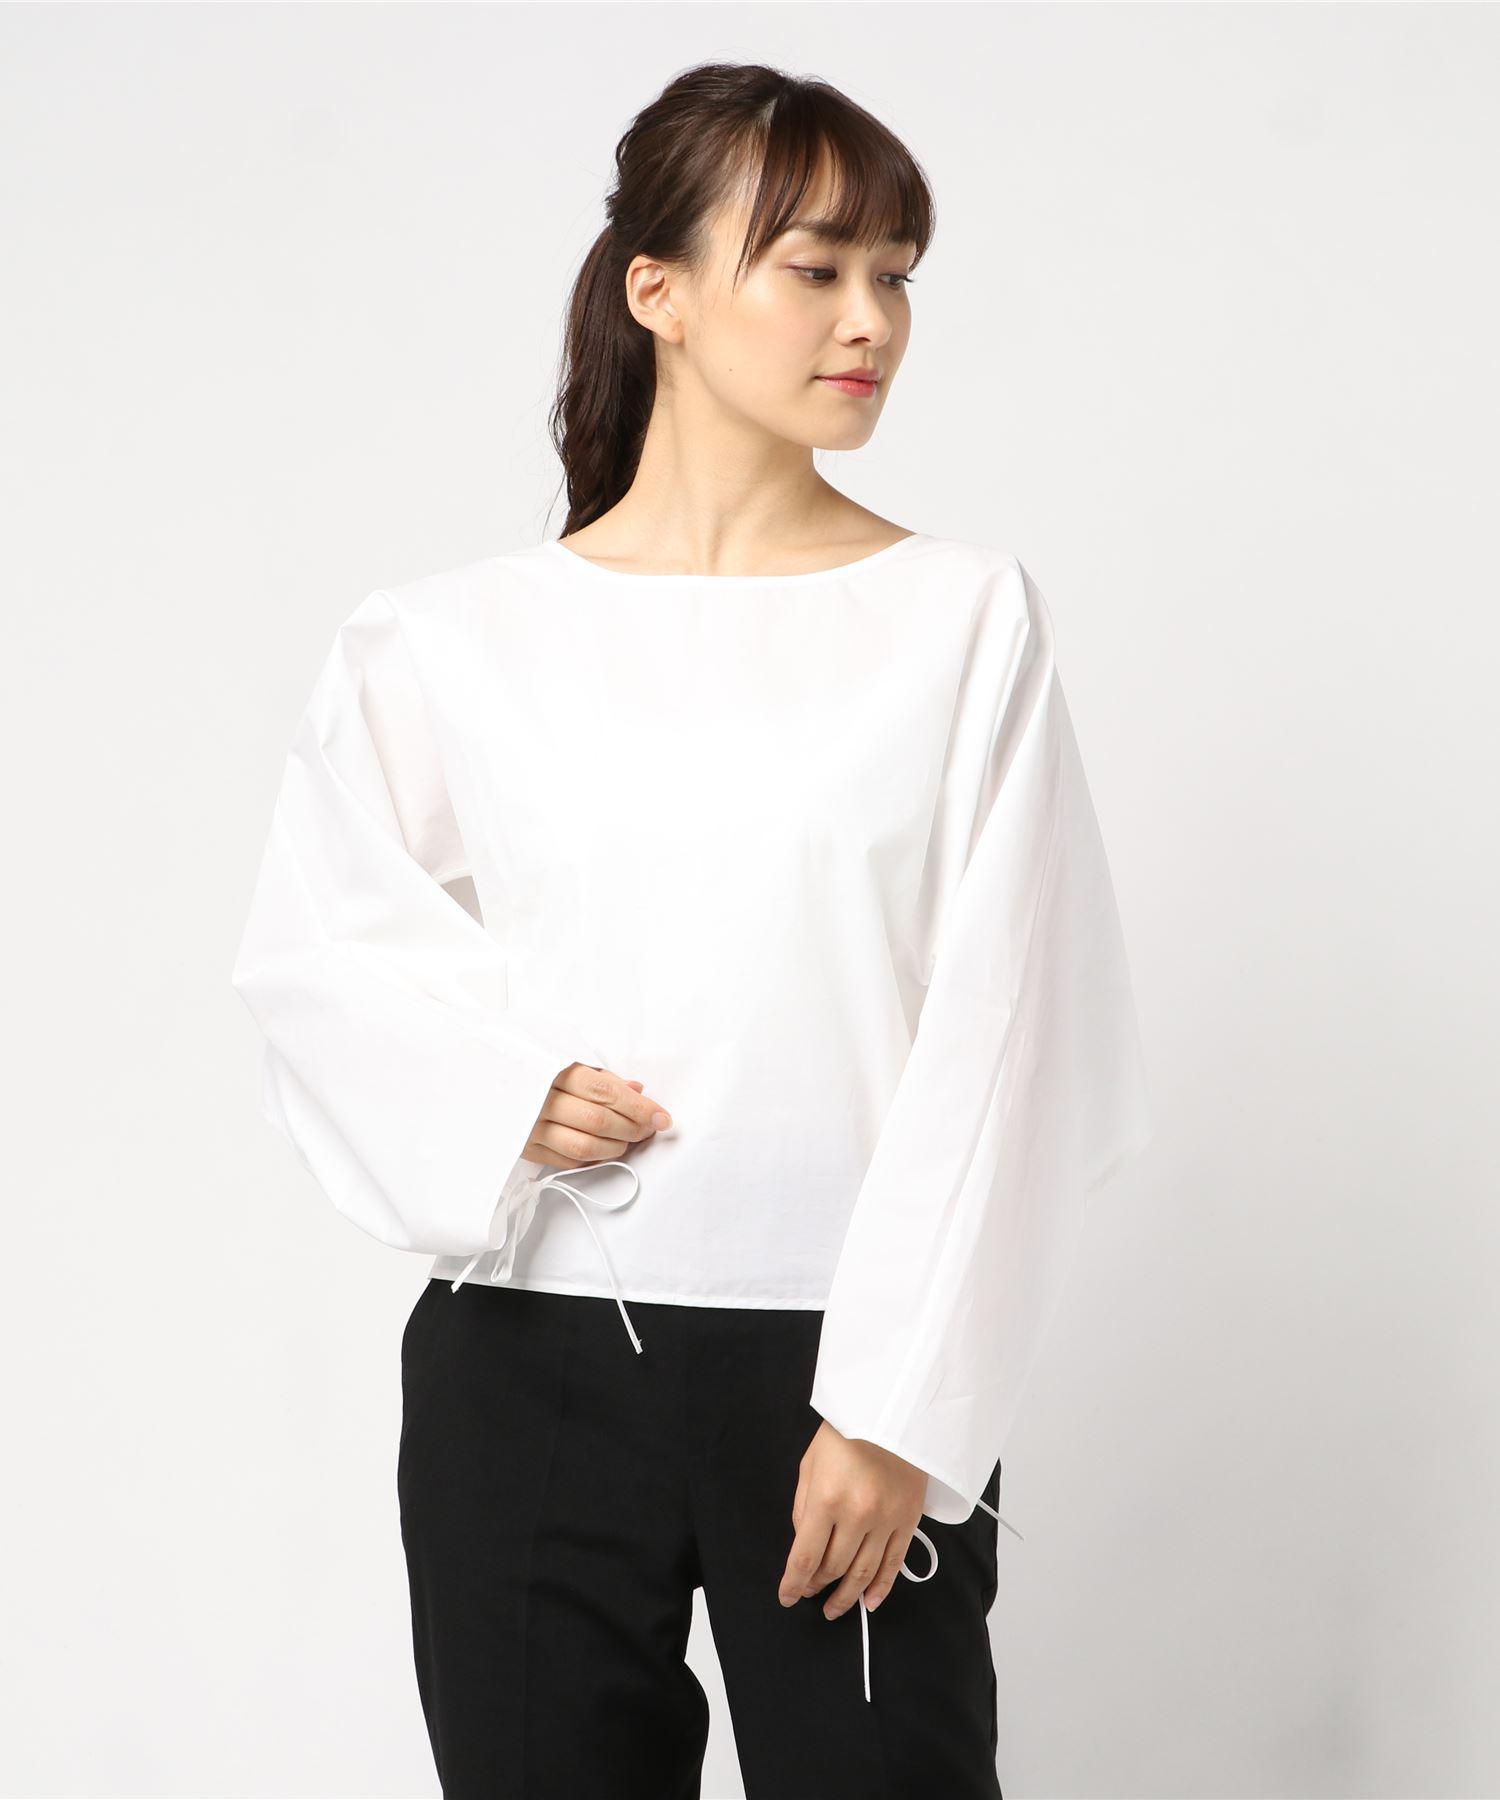 AERON エアロン / 変形袖デザイン コットントップス